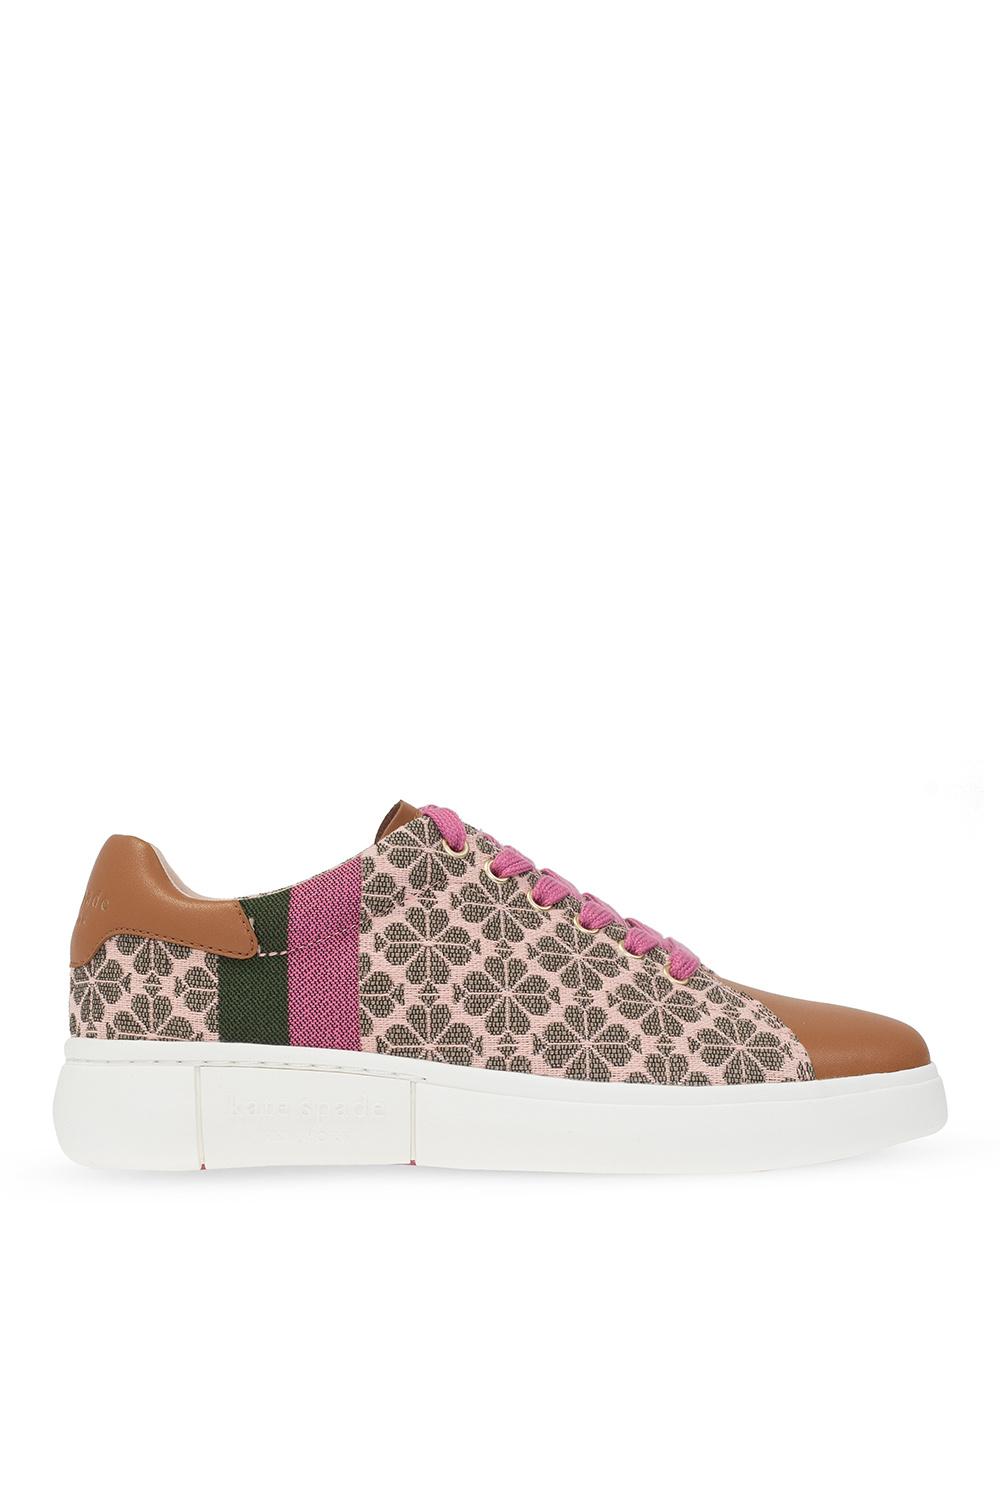 Kate Spade 'Keswick' sneakers